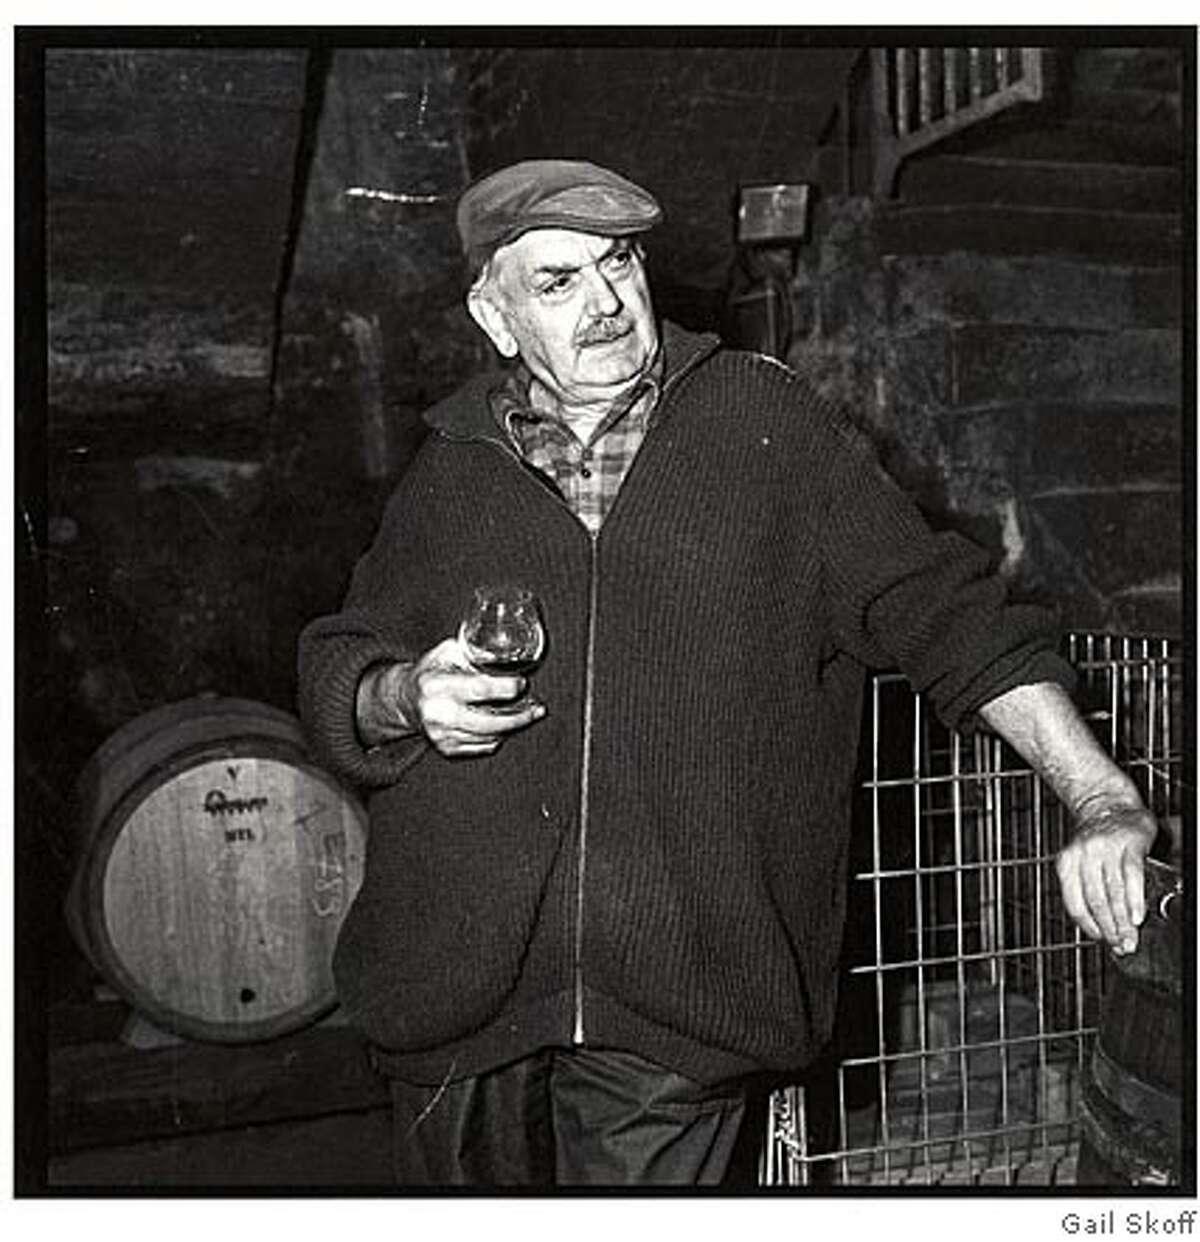 Pierre Guillemot, Savigny-les-Beauve Photo Credit: Gail Skoff